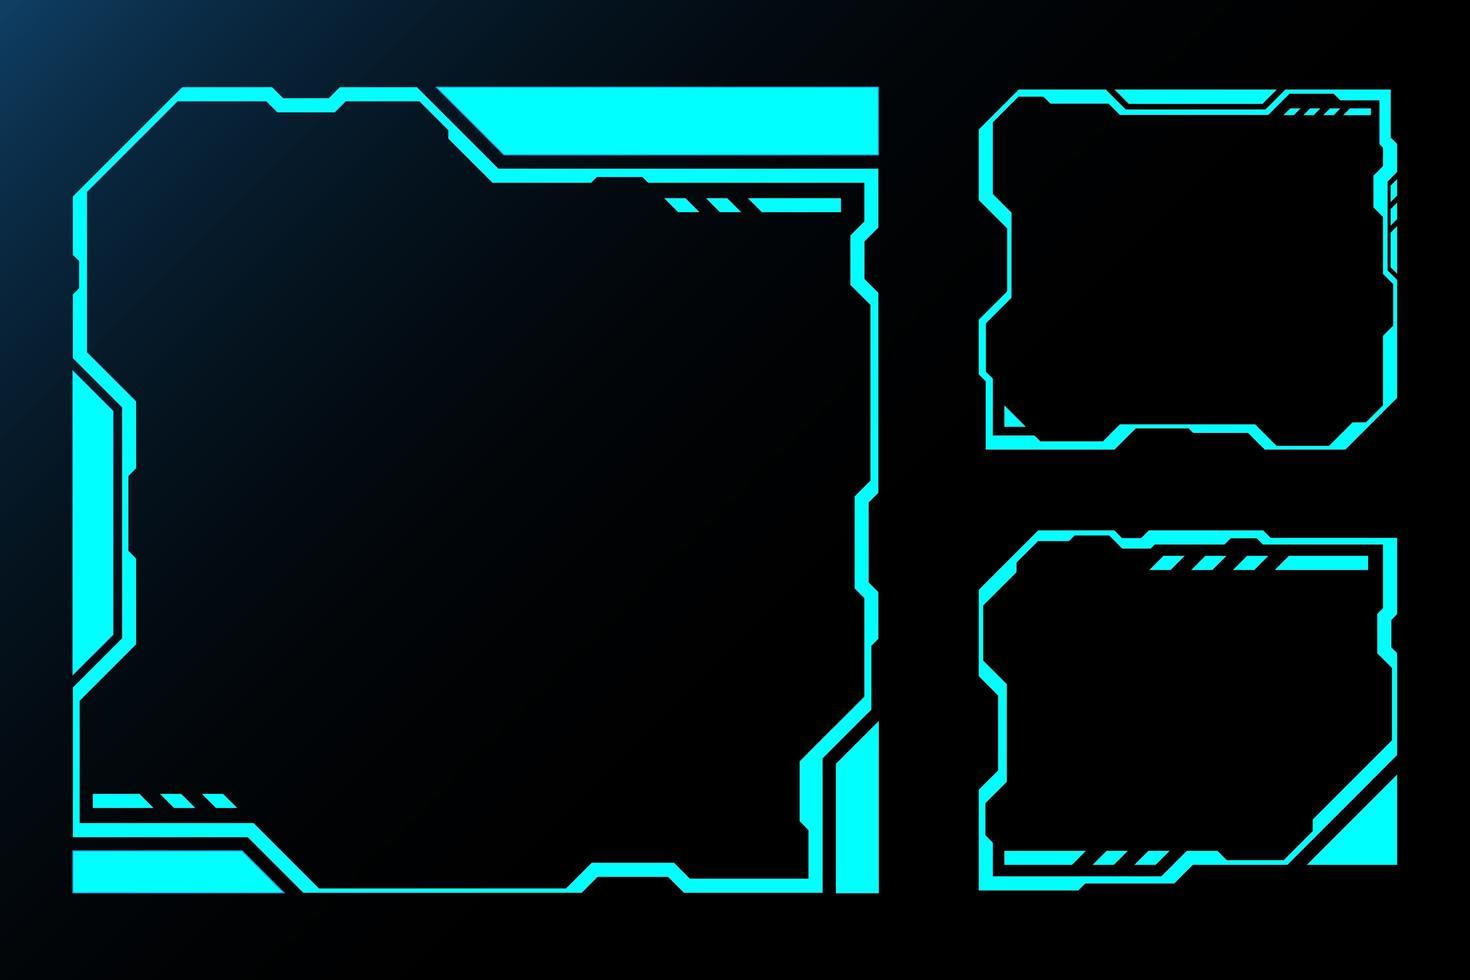 technologie toekomstige interface hud kaderset vector